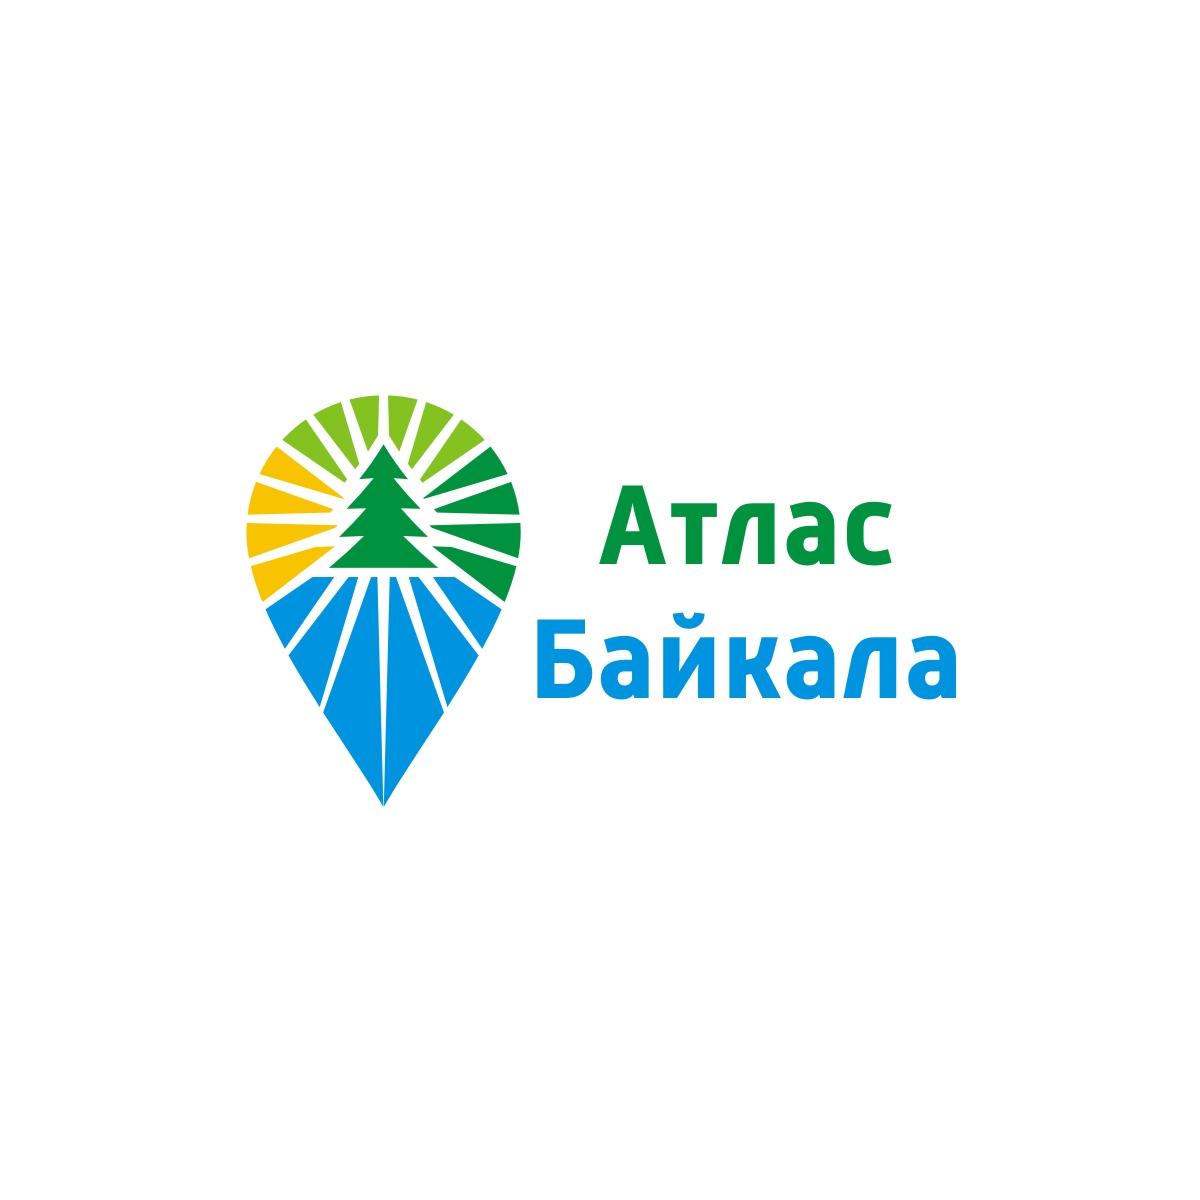 Разработка логотипа Атлас Байкала фото f_0835b19255ce82e1.jpg